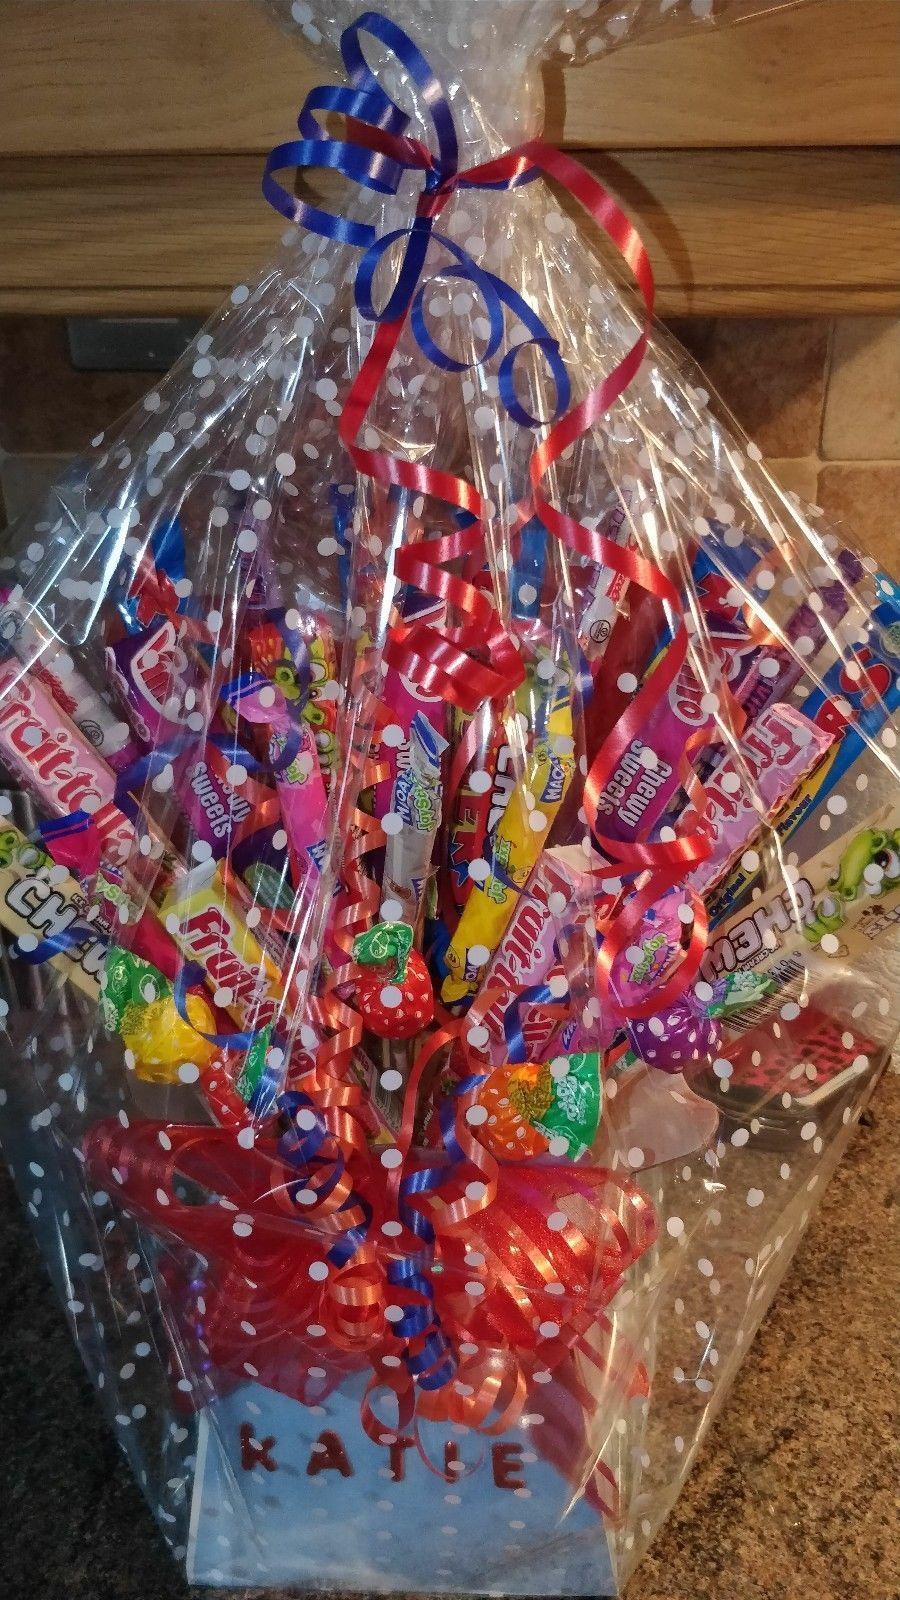 Details about retro sweet tree bouquet gift hamper